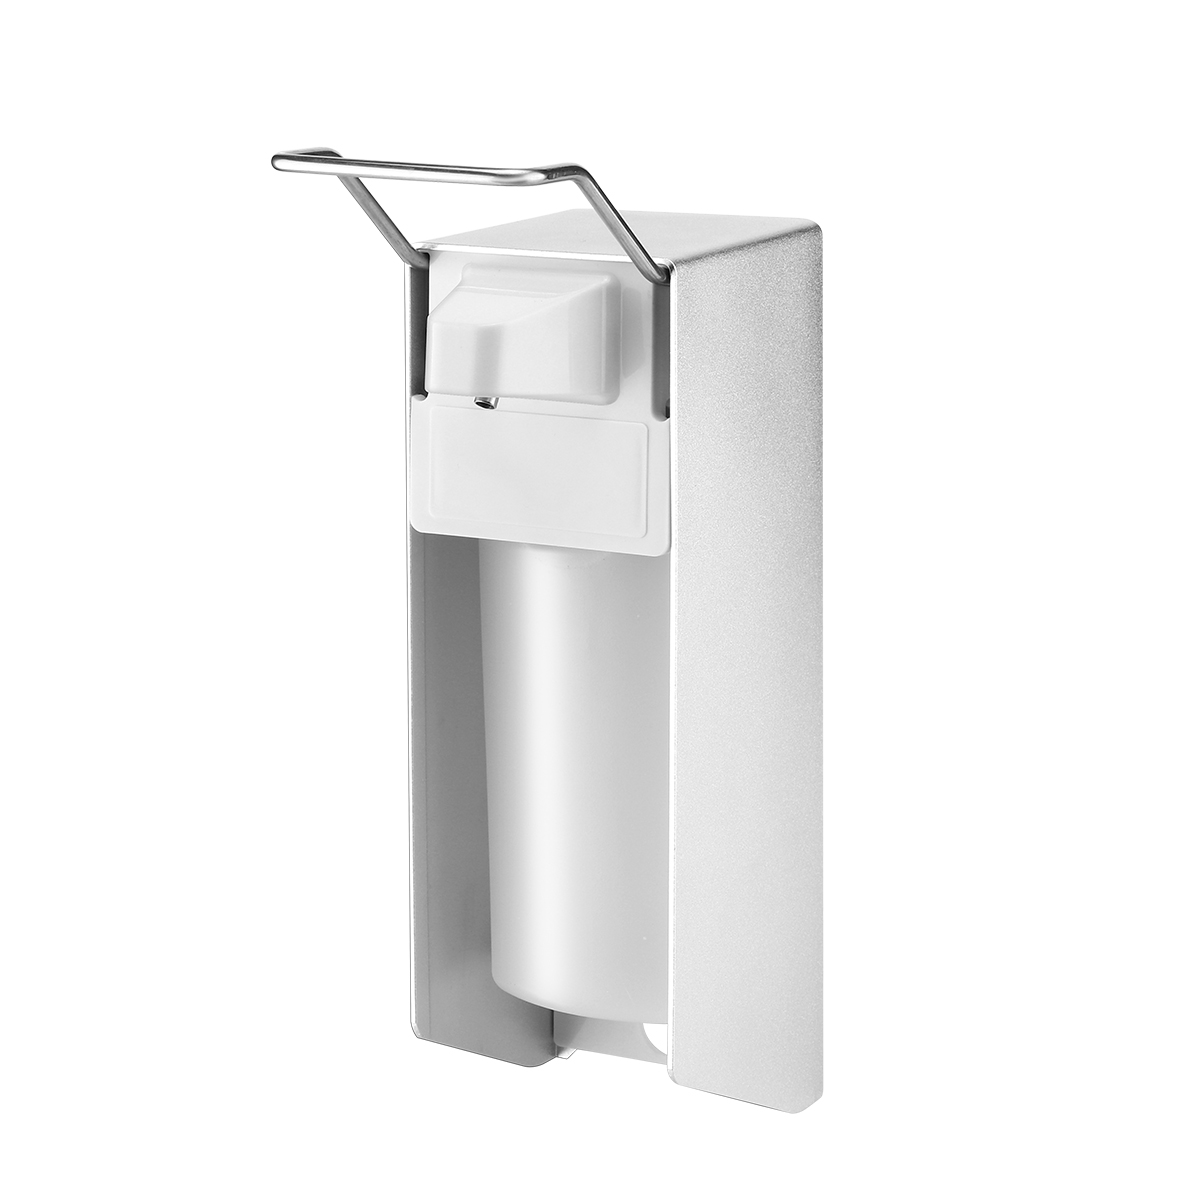 H2fbe8a0685124ef4b0a004db9c4b91a5C Wall-Mount Liquid Soap Dispenser Pump Hospital Elbow Press Hand Sanitizer Soap Dispenser Bottle For Kitchen Hotel Bathroom